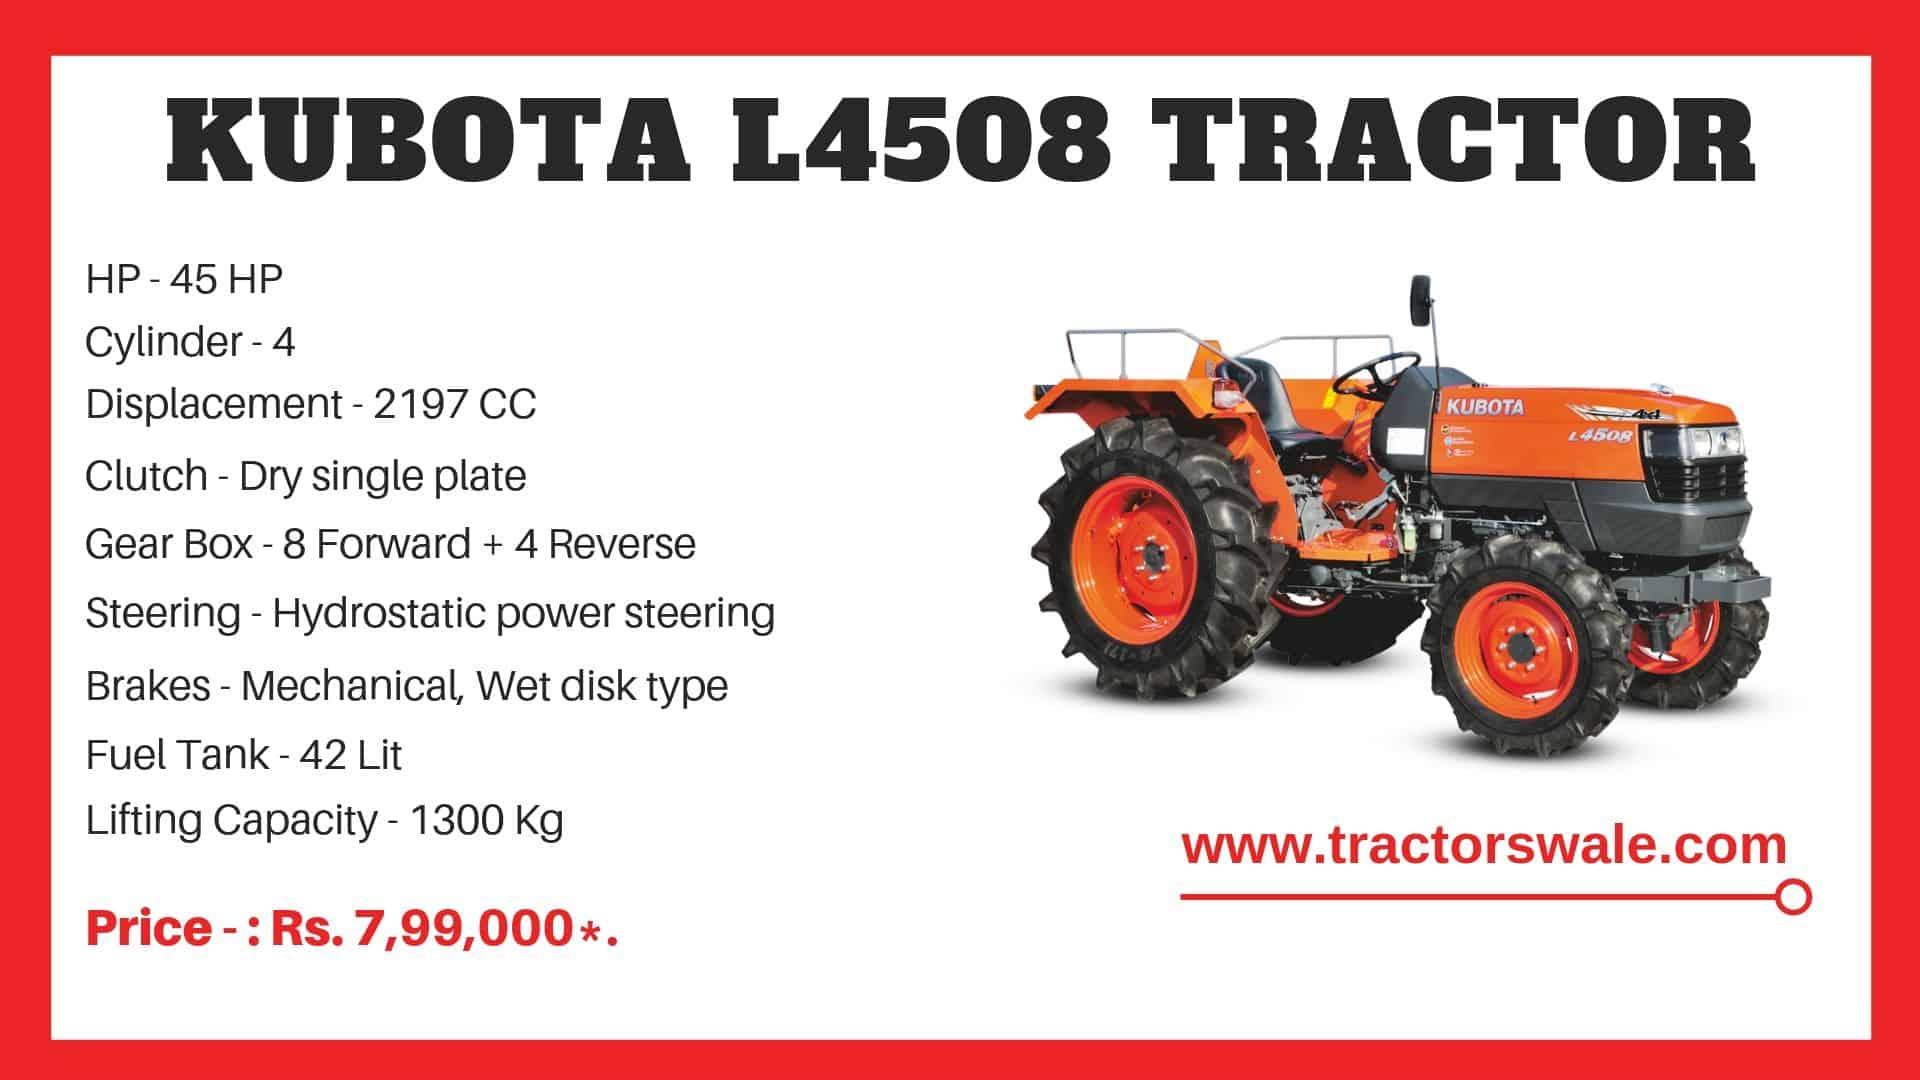 Kubota l4508 mini tractor specifications